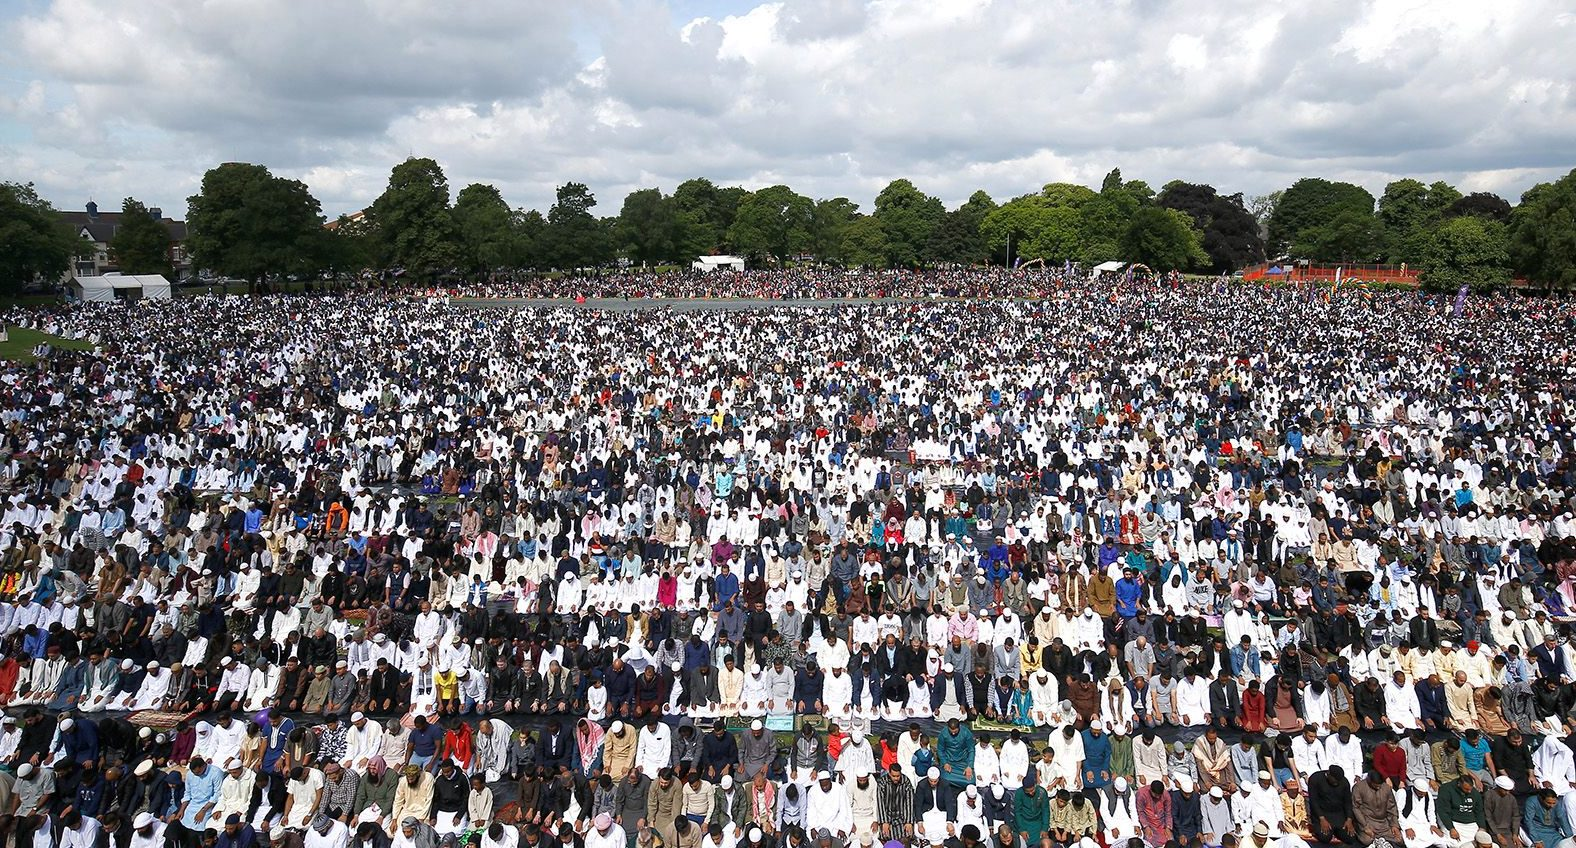 Around 140,000 muslims attend Eid al-Fitr prayers to mark the end of Ramadan, in Small Heath Park in Birmingham